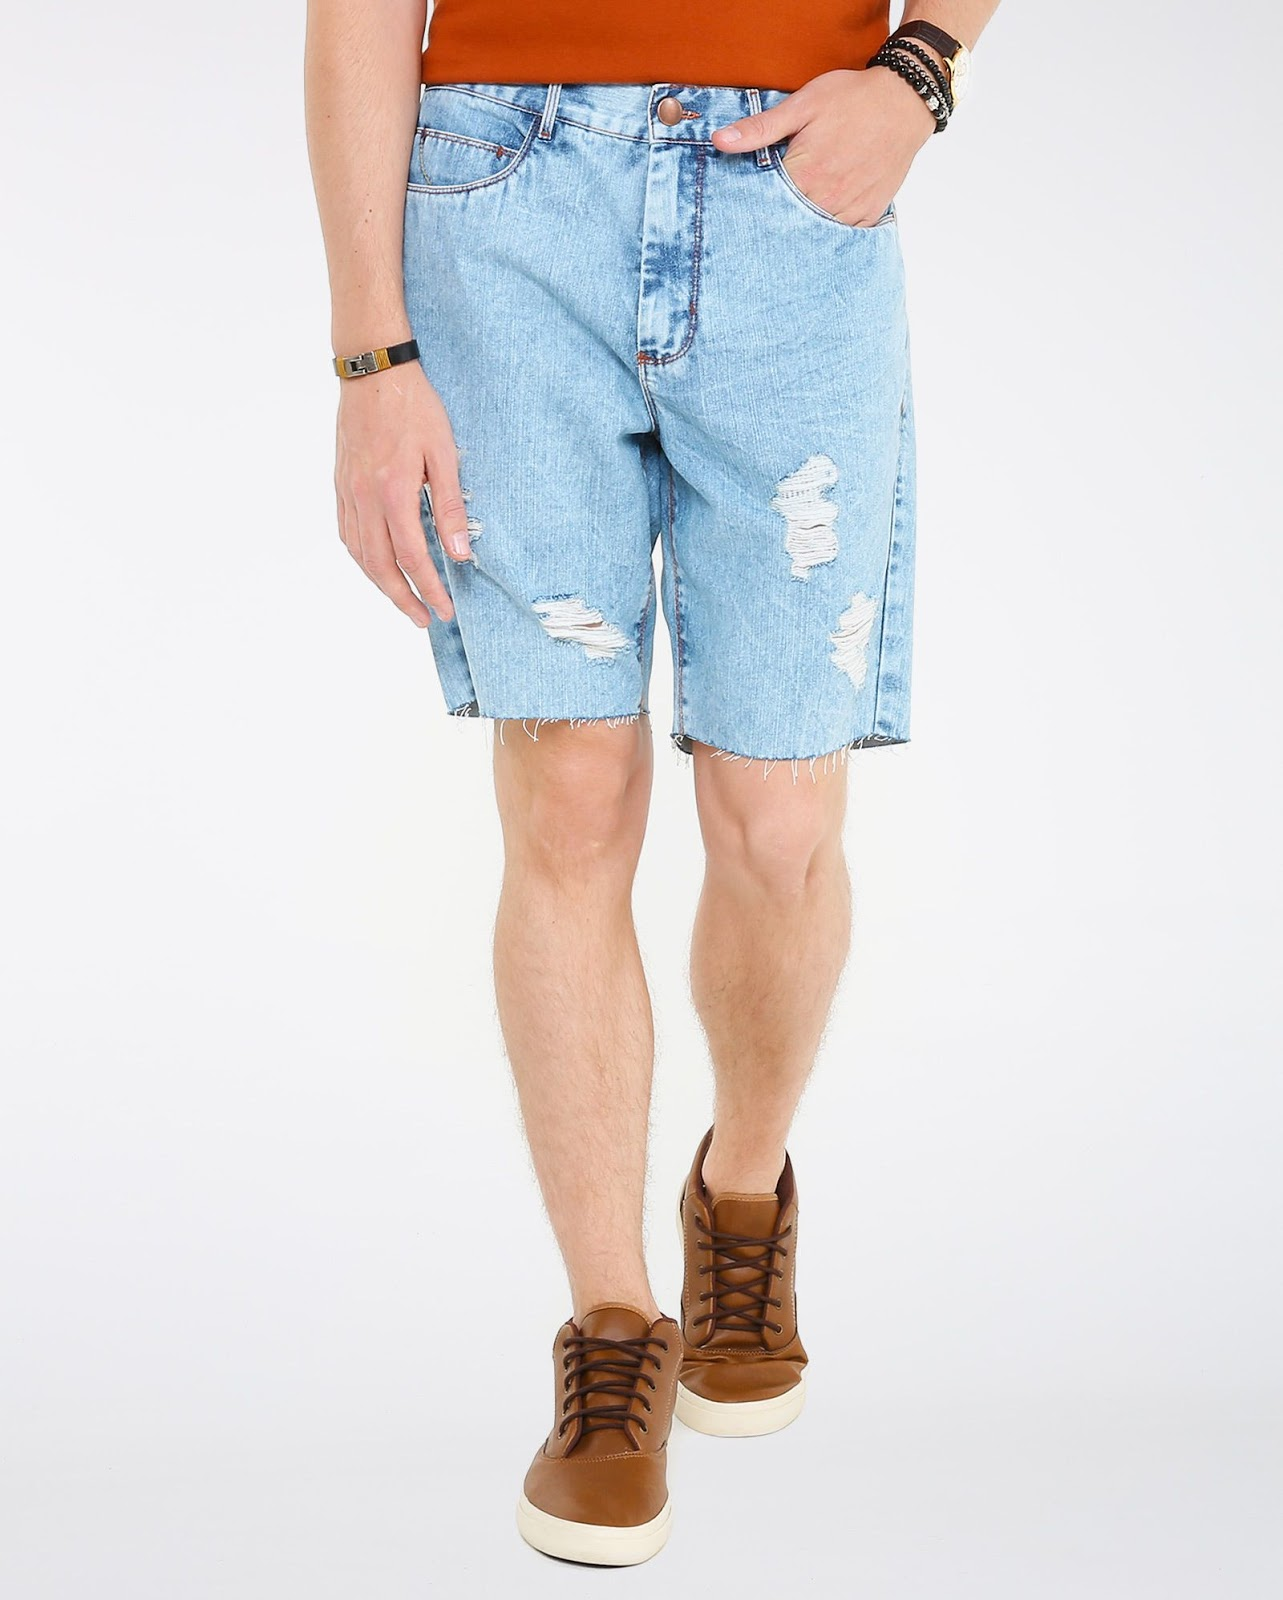 LEO KLEIN - KADU DANTAS PARA RIACHUELO - Bermuda Jeans Destroyed